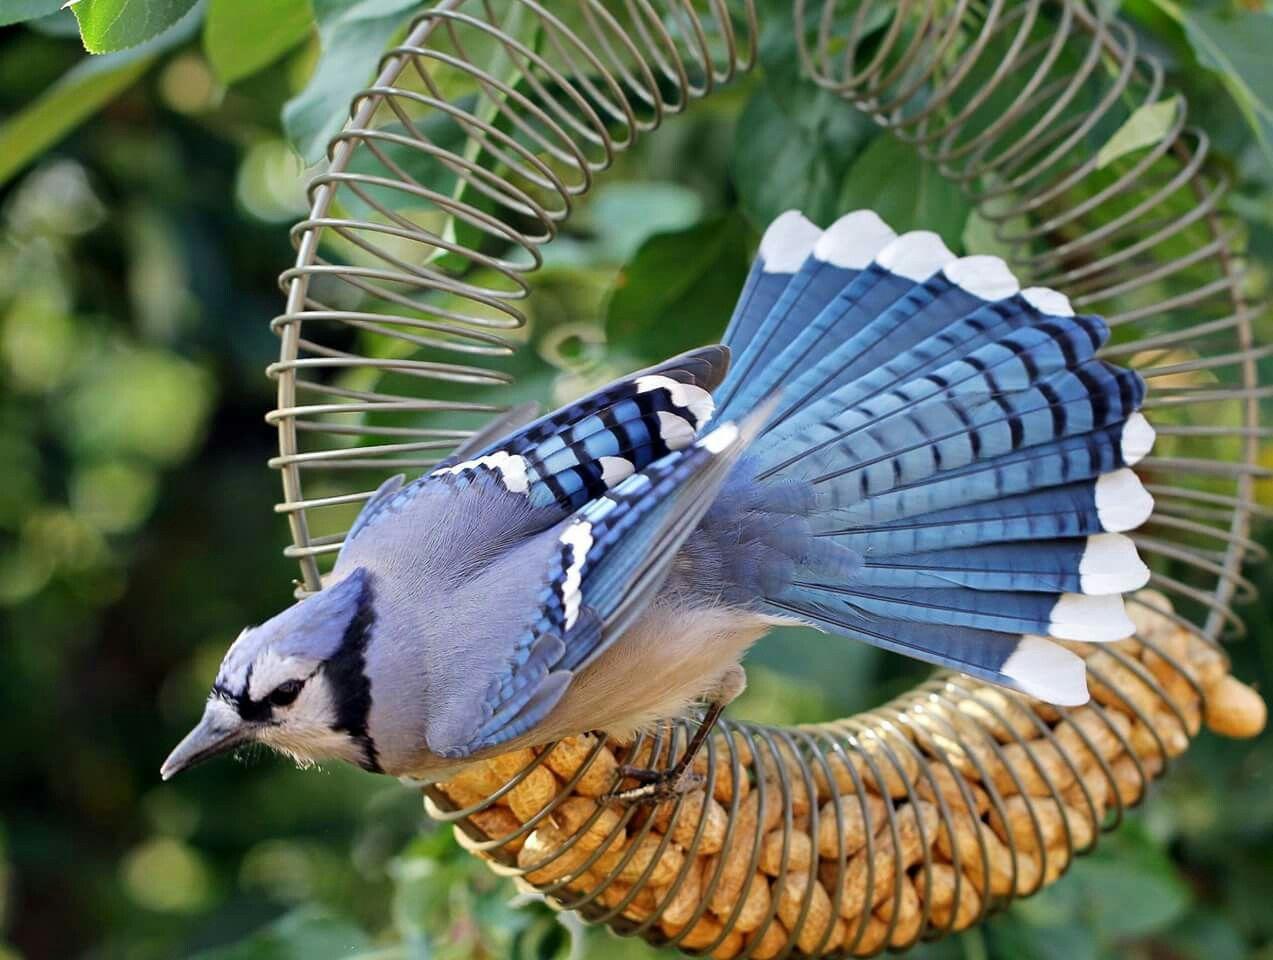 Blue Jay | Backyard birds, How to attract birds, Birds